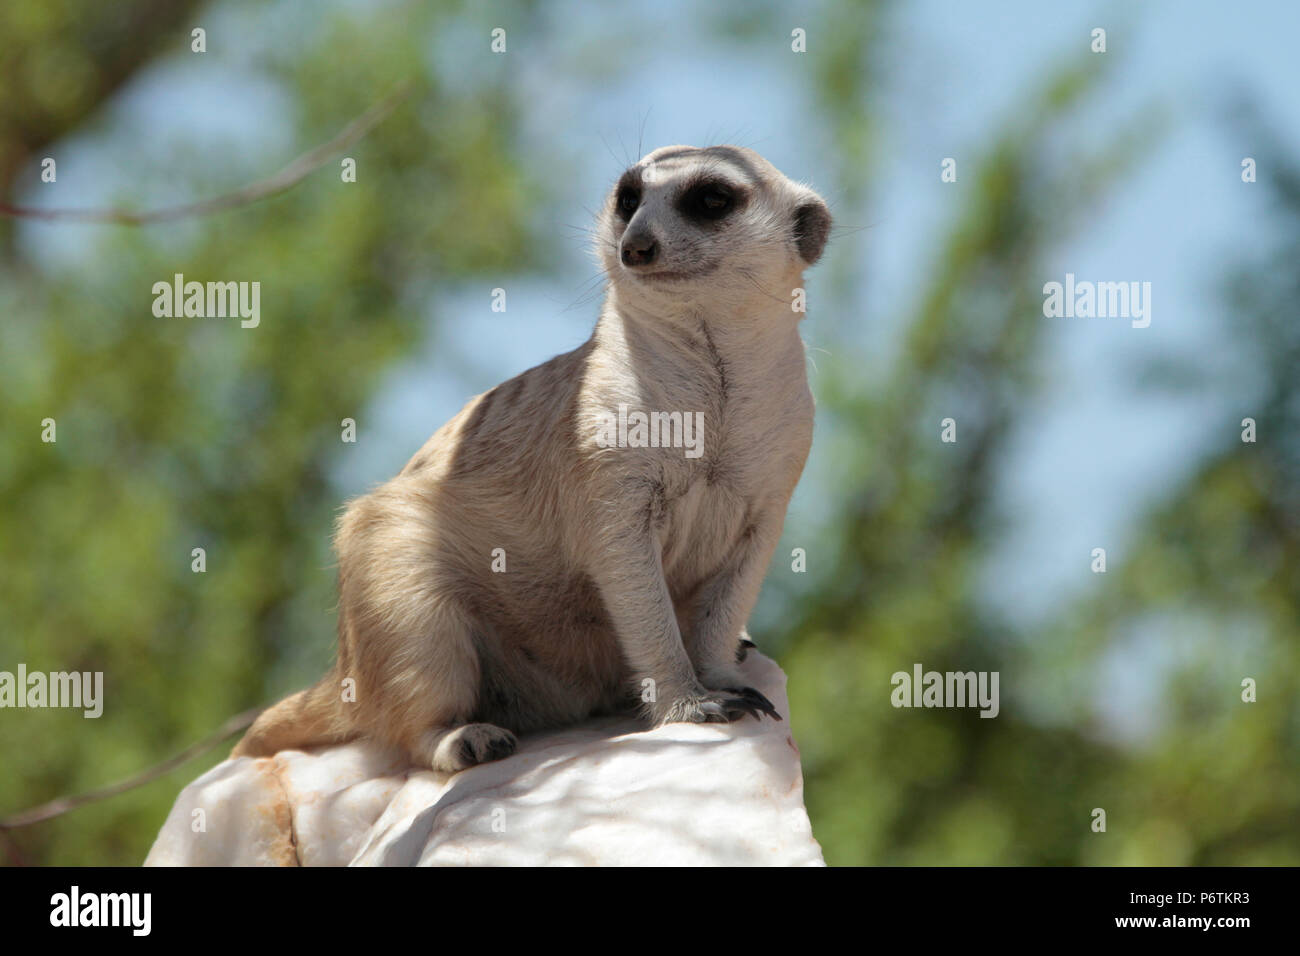 Meerkat or Suricat - Suricata suricatta -  crouched on white, quartz rock, looking around. Kalahari Namibia Stock Photo